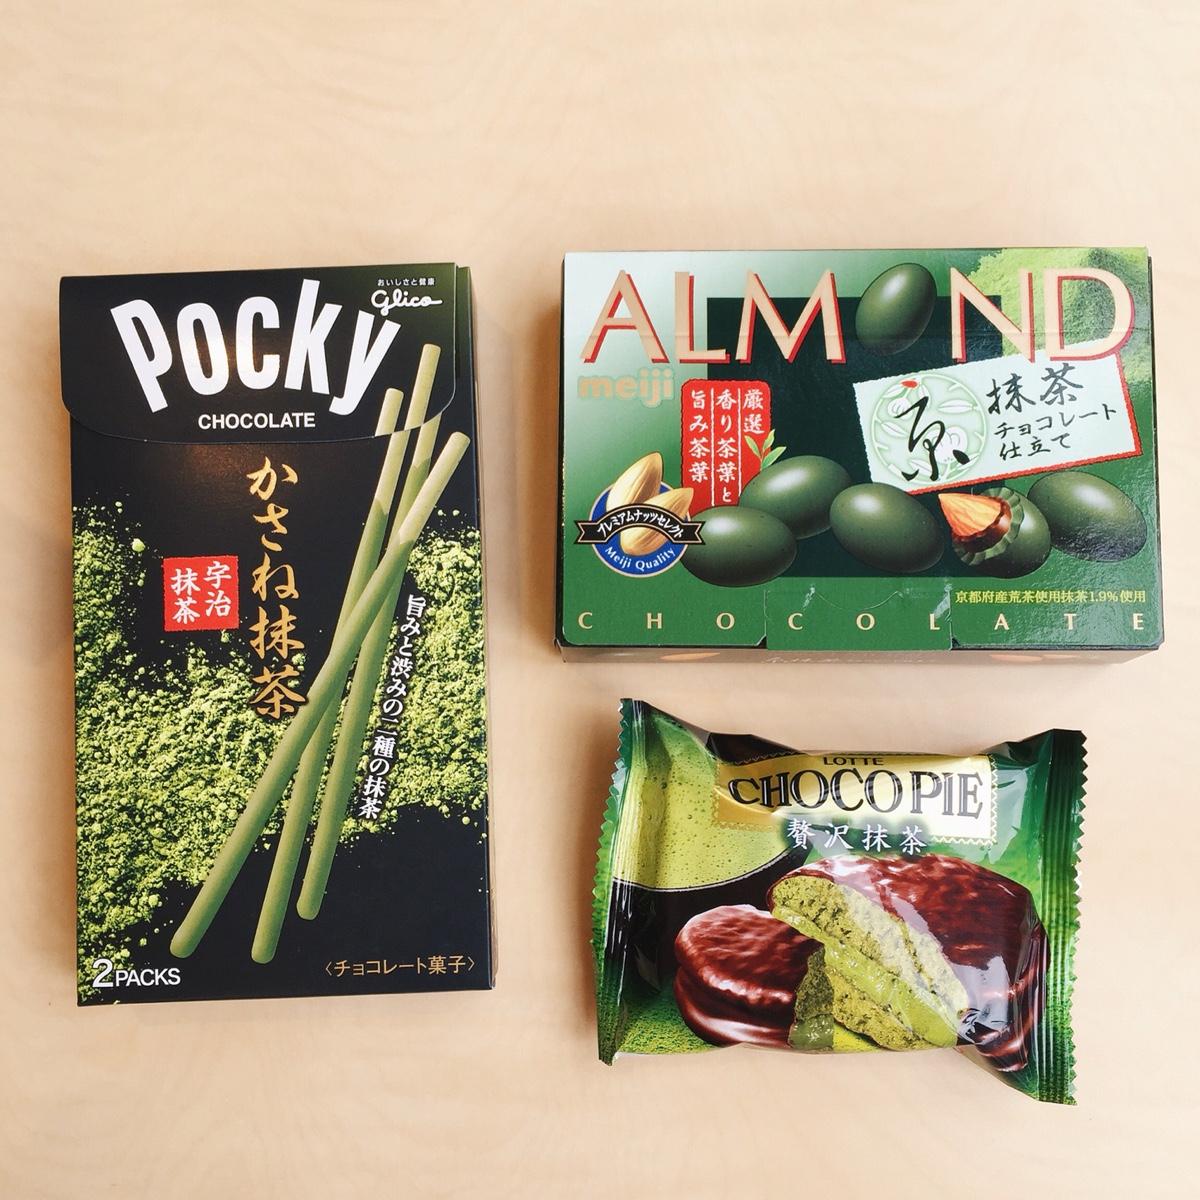 pocky-almond-chocopie-matcha.jpg